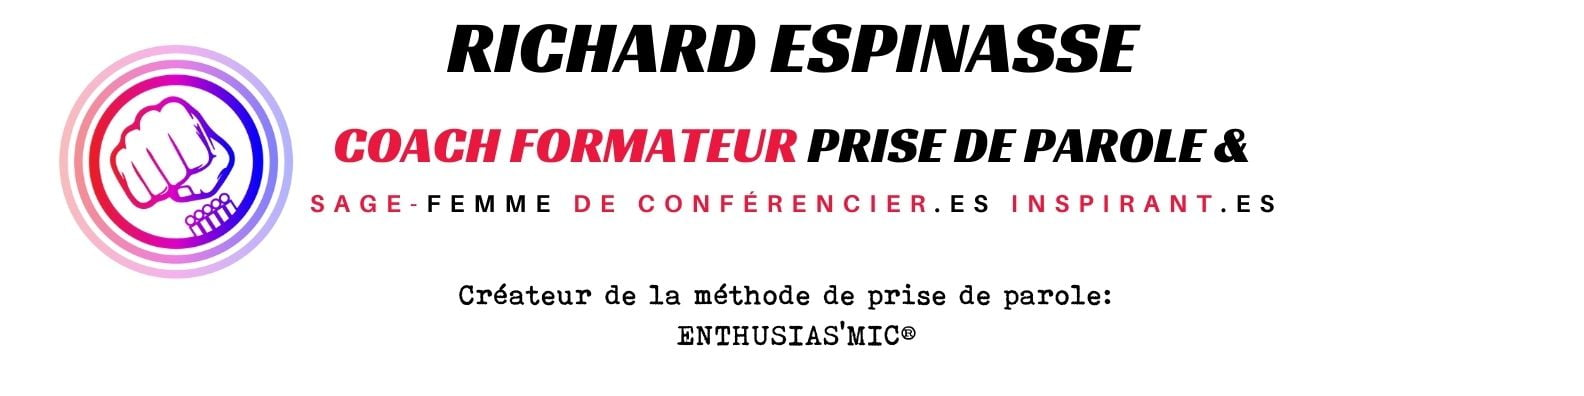 Richard ESPINASSE